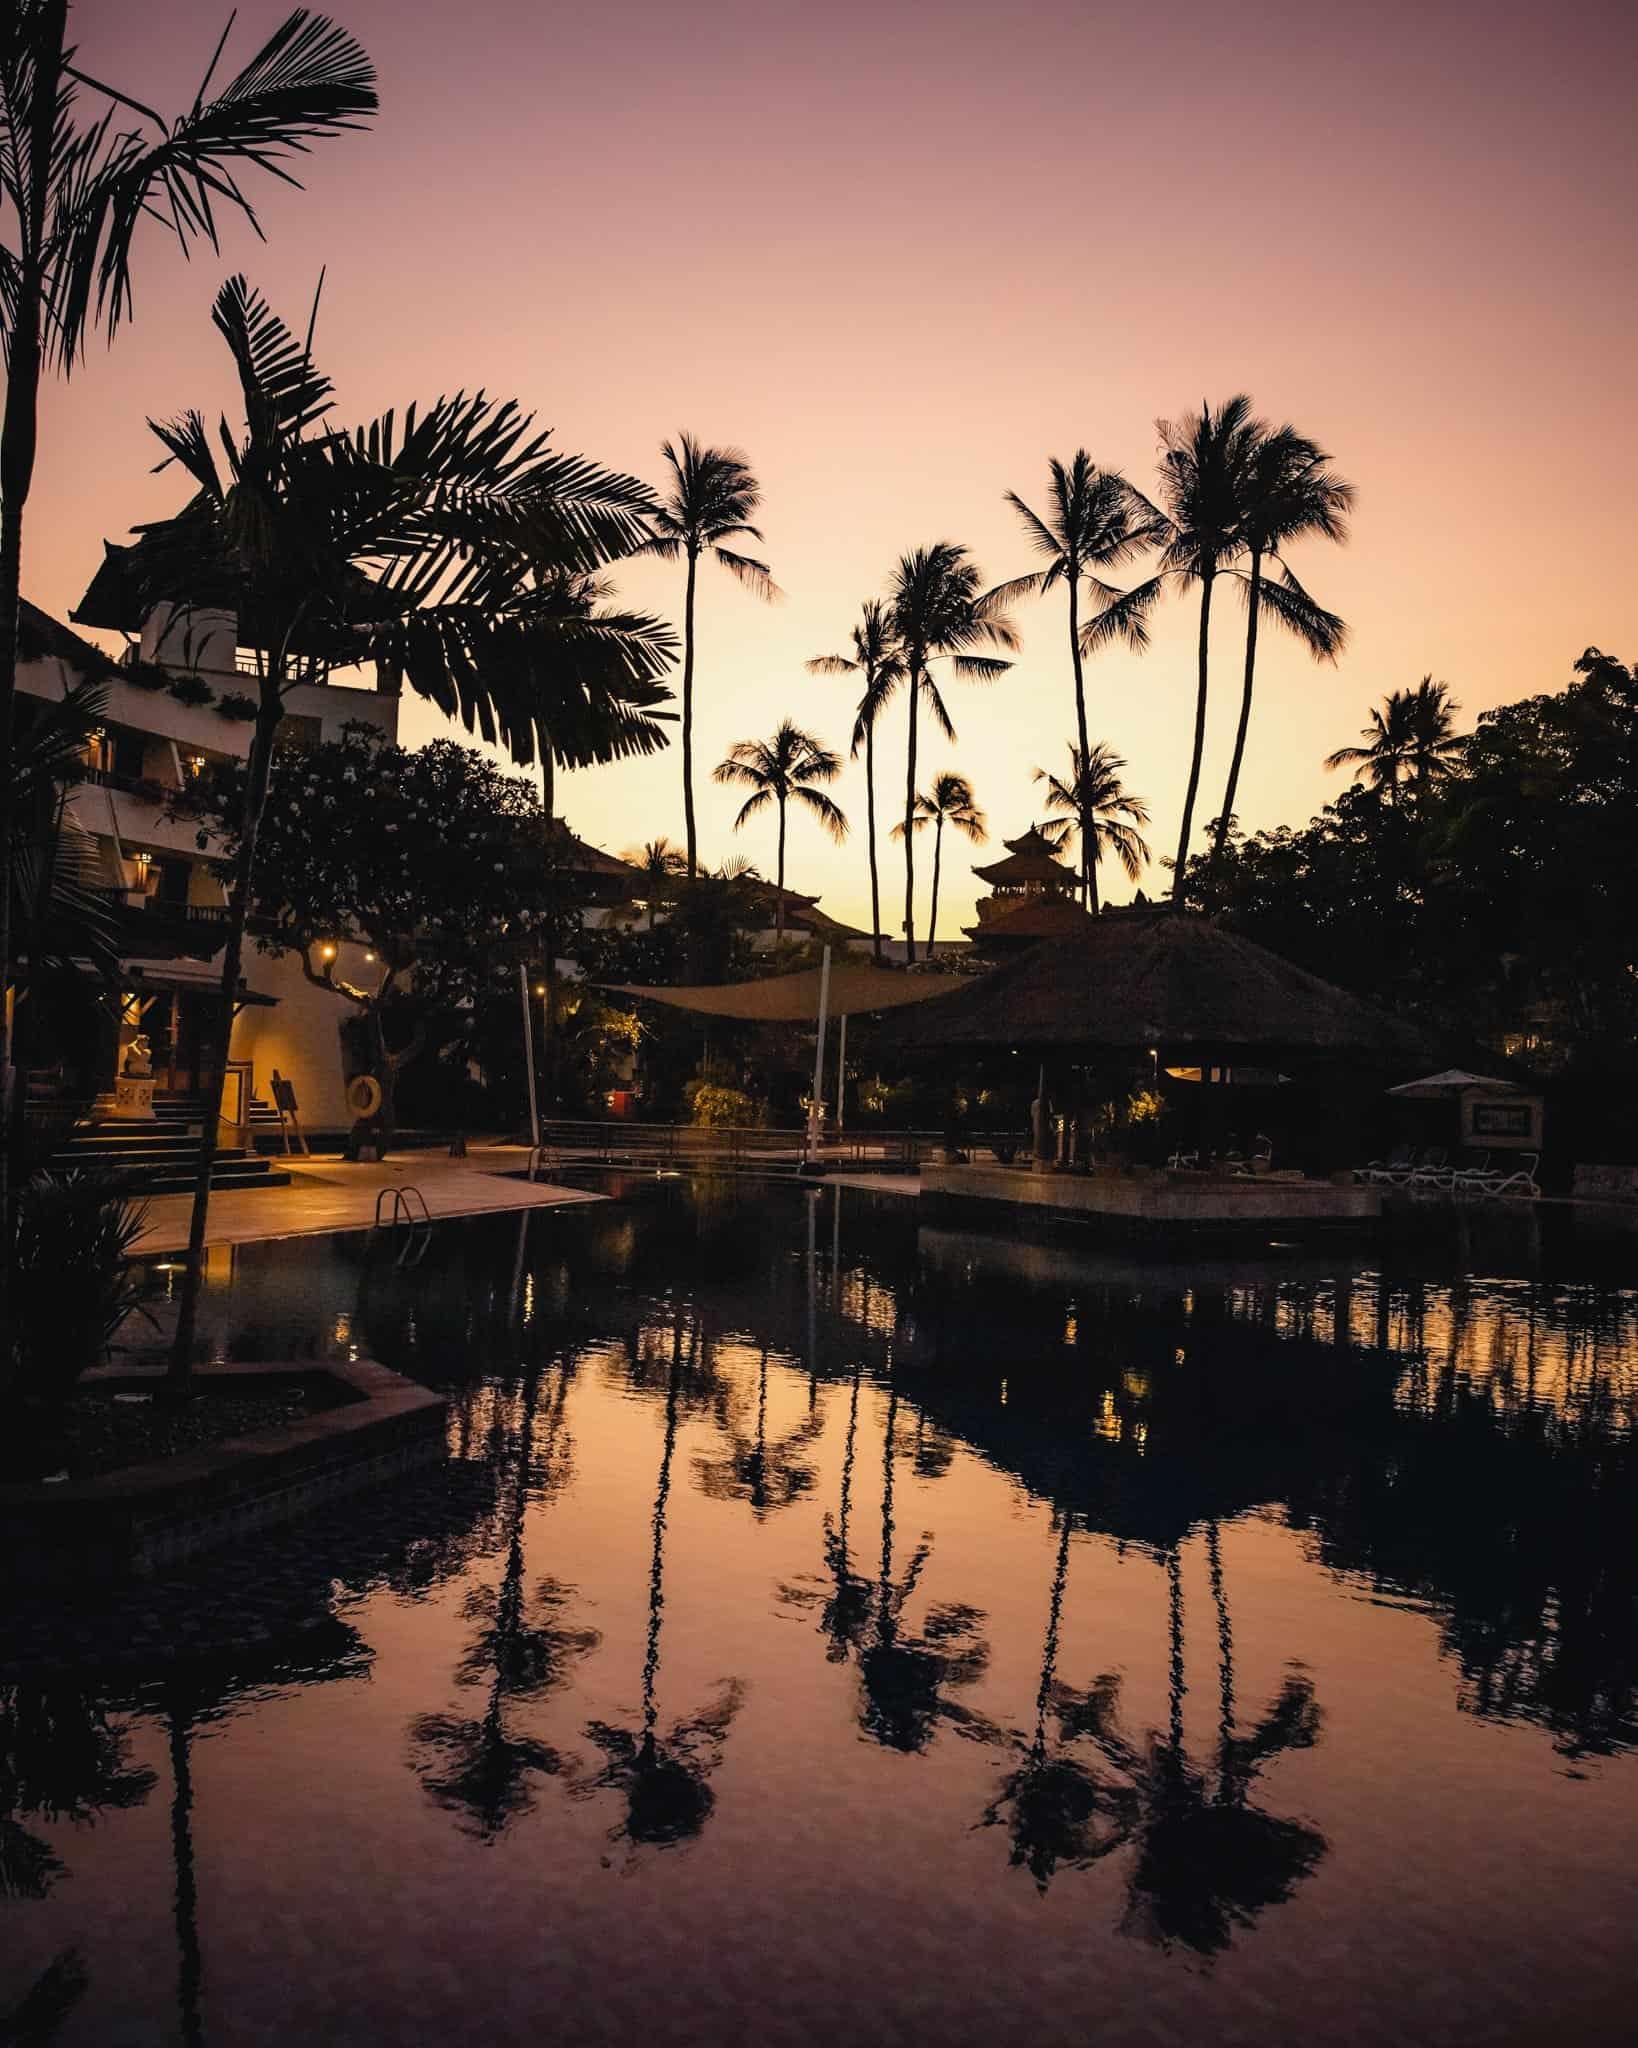 Sunrise at Nusa Dua Beach Resort and Spa - The Next Trip